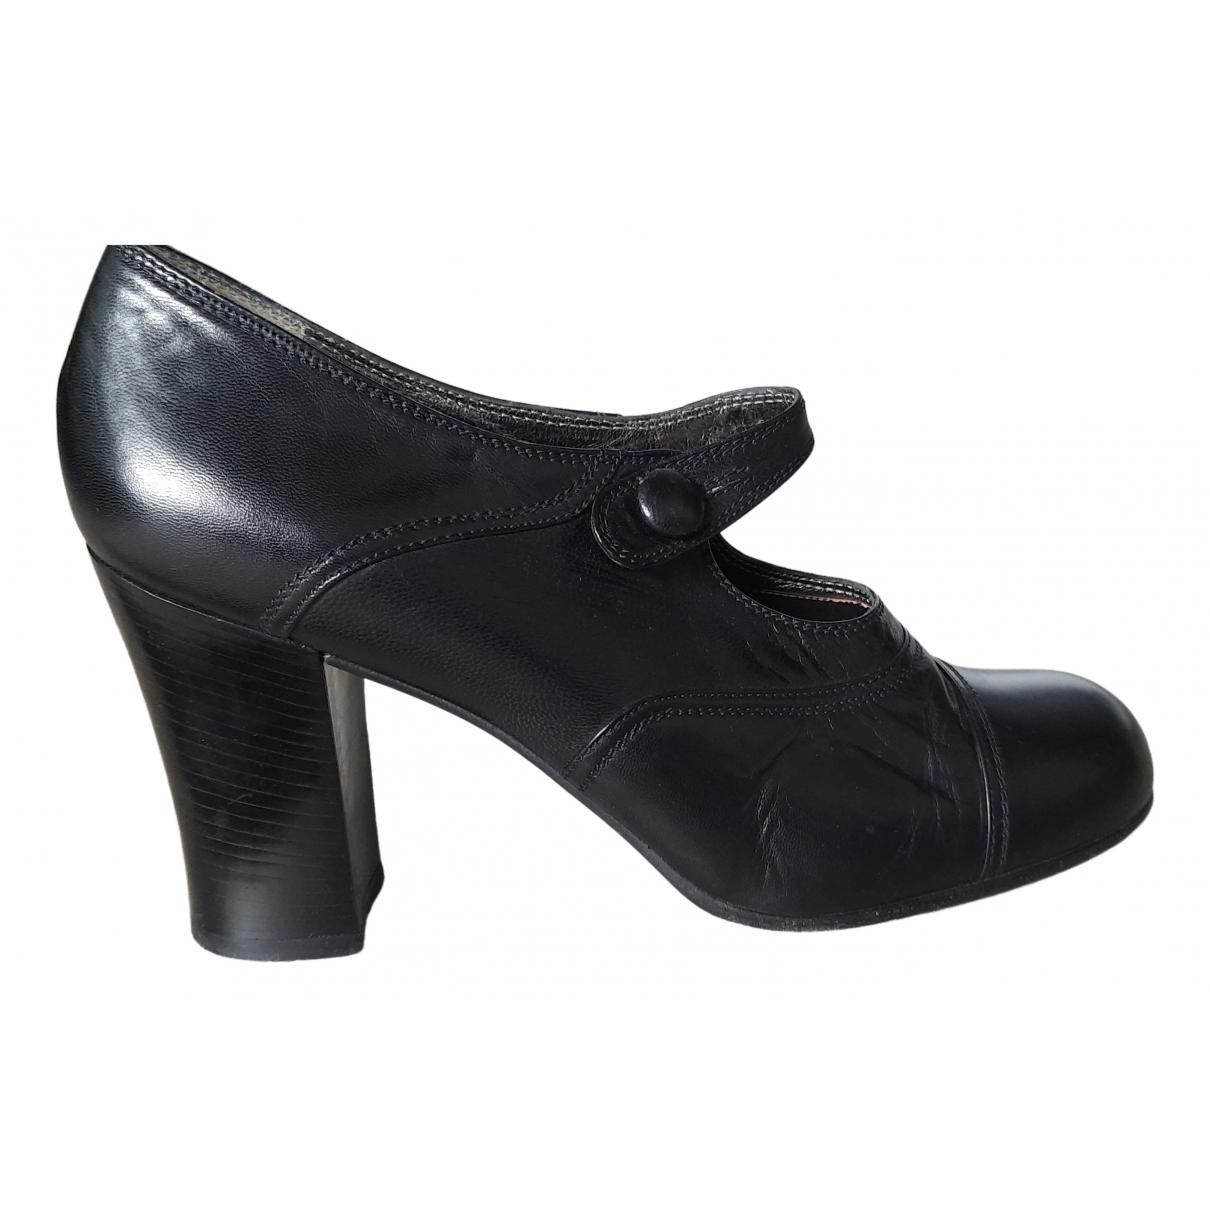 Prada Mary Jane Black Leather Heels for Women 40 EU